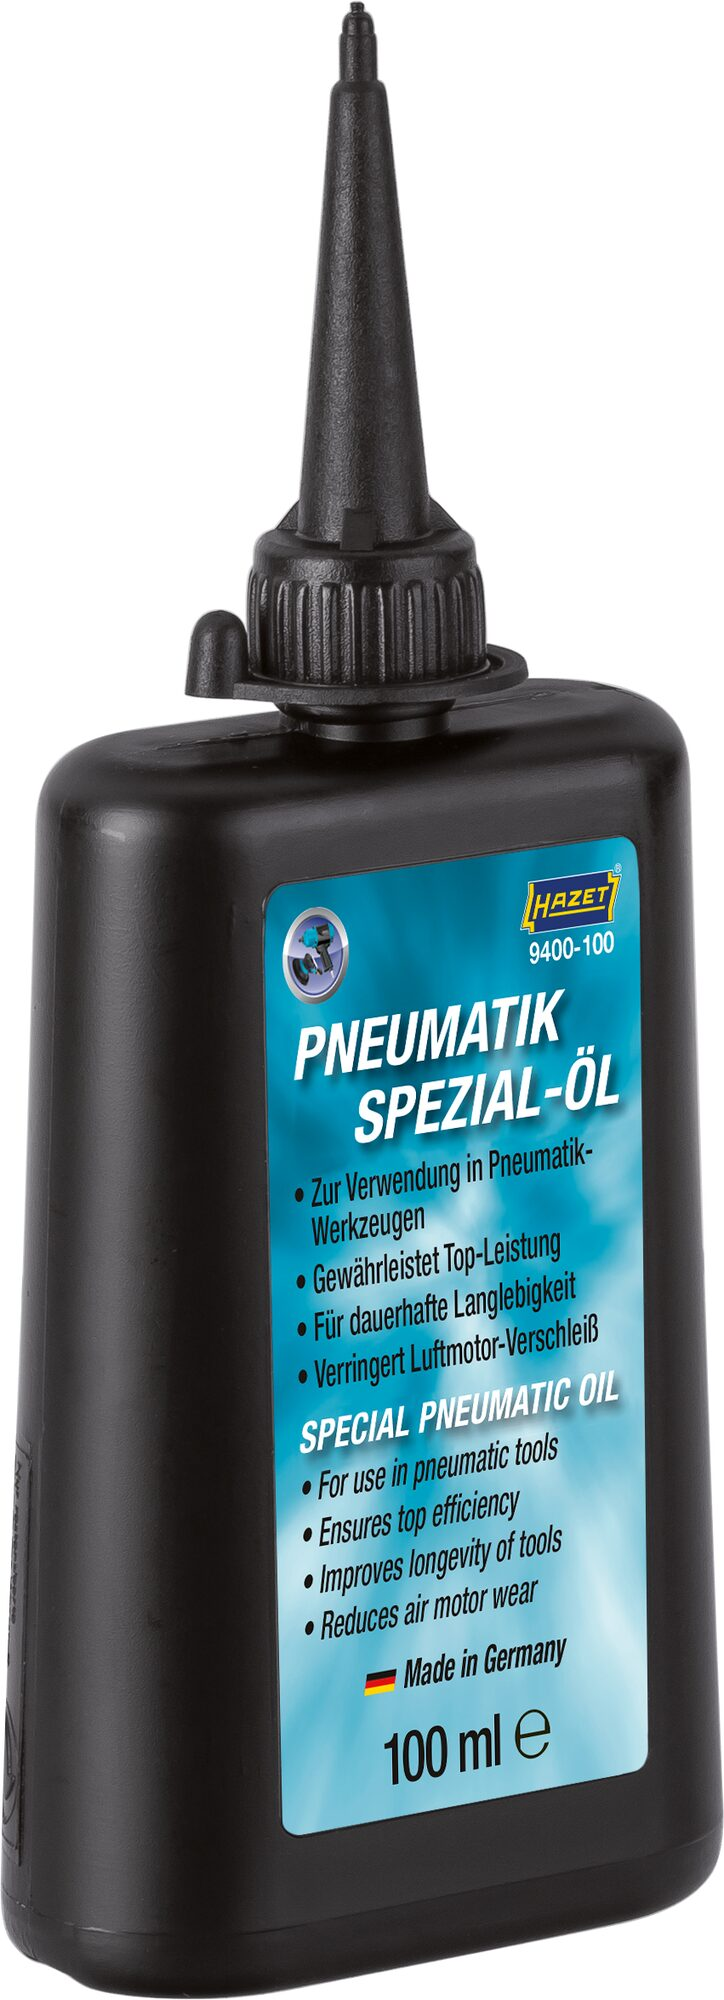 HAZET Pneumatik Spezial-Öl ∙ 100ml 9400-100